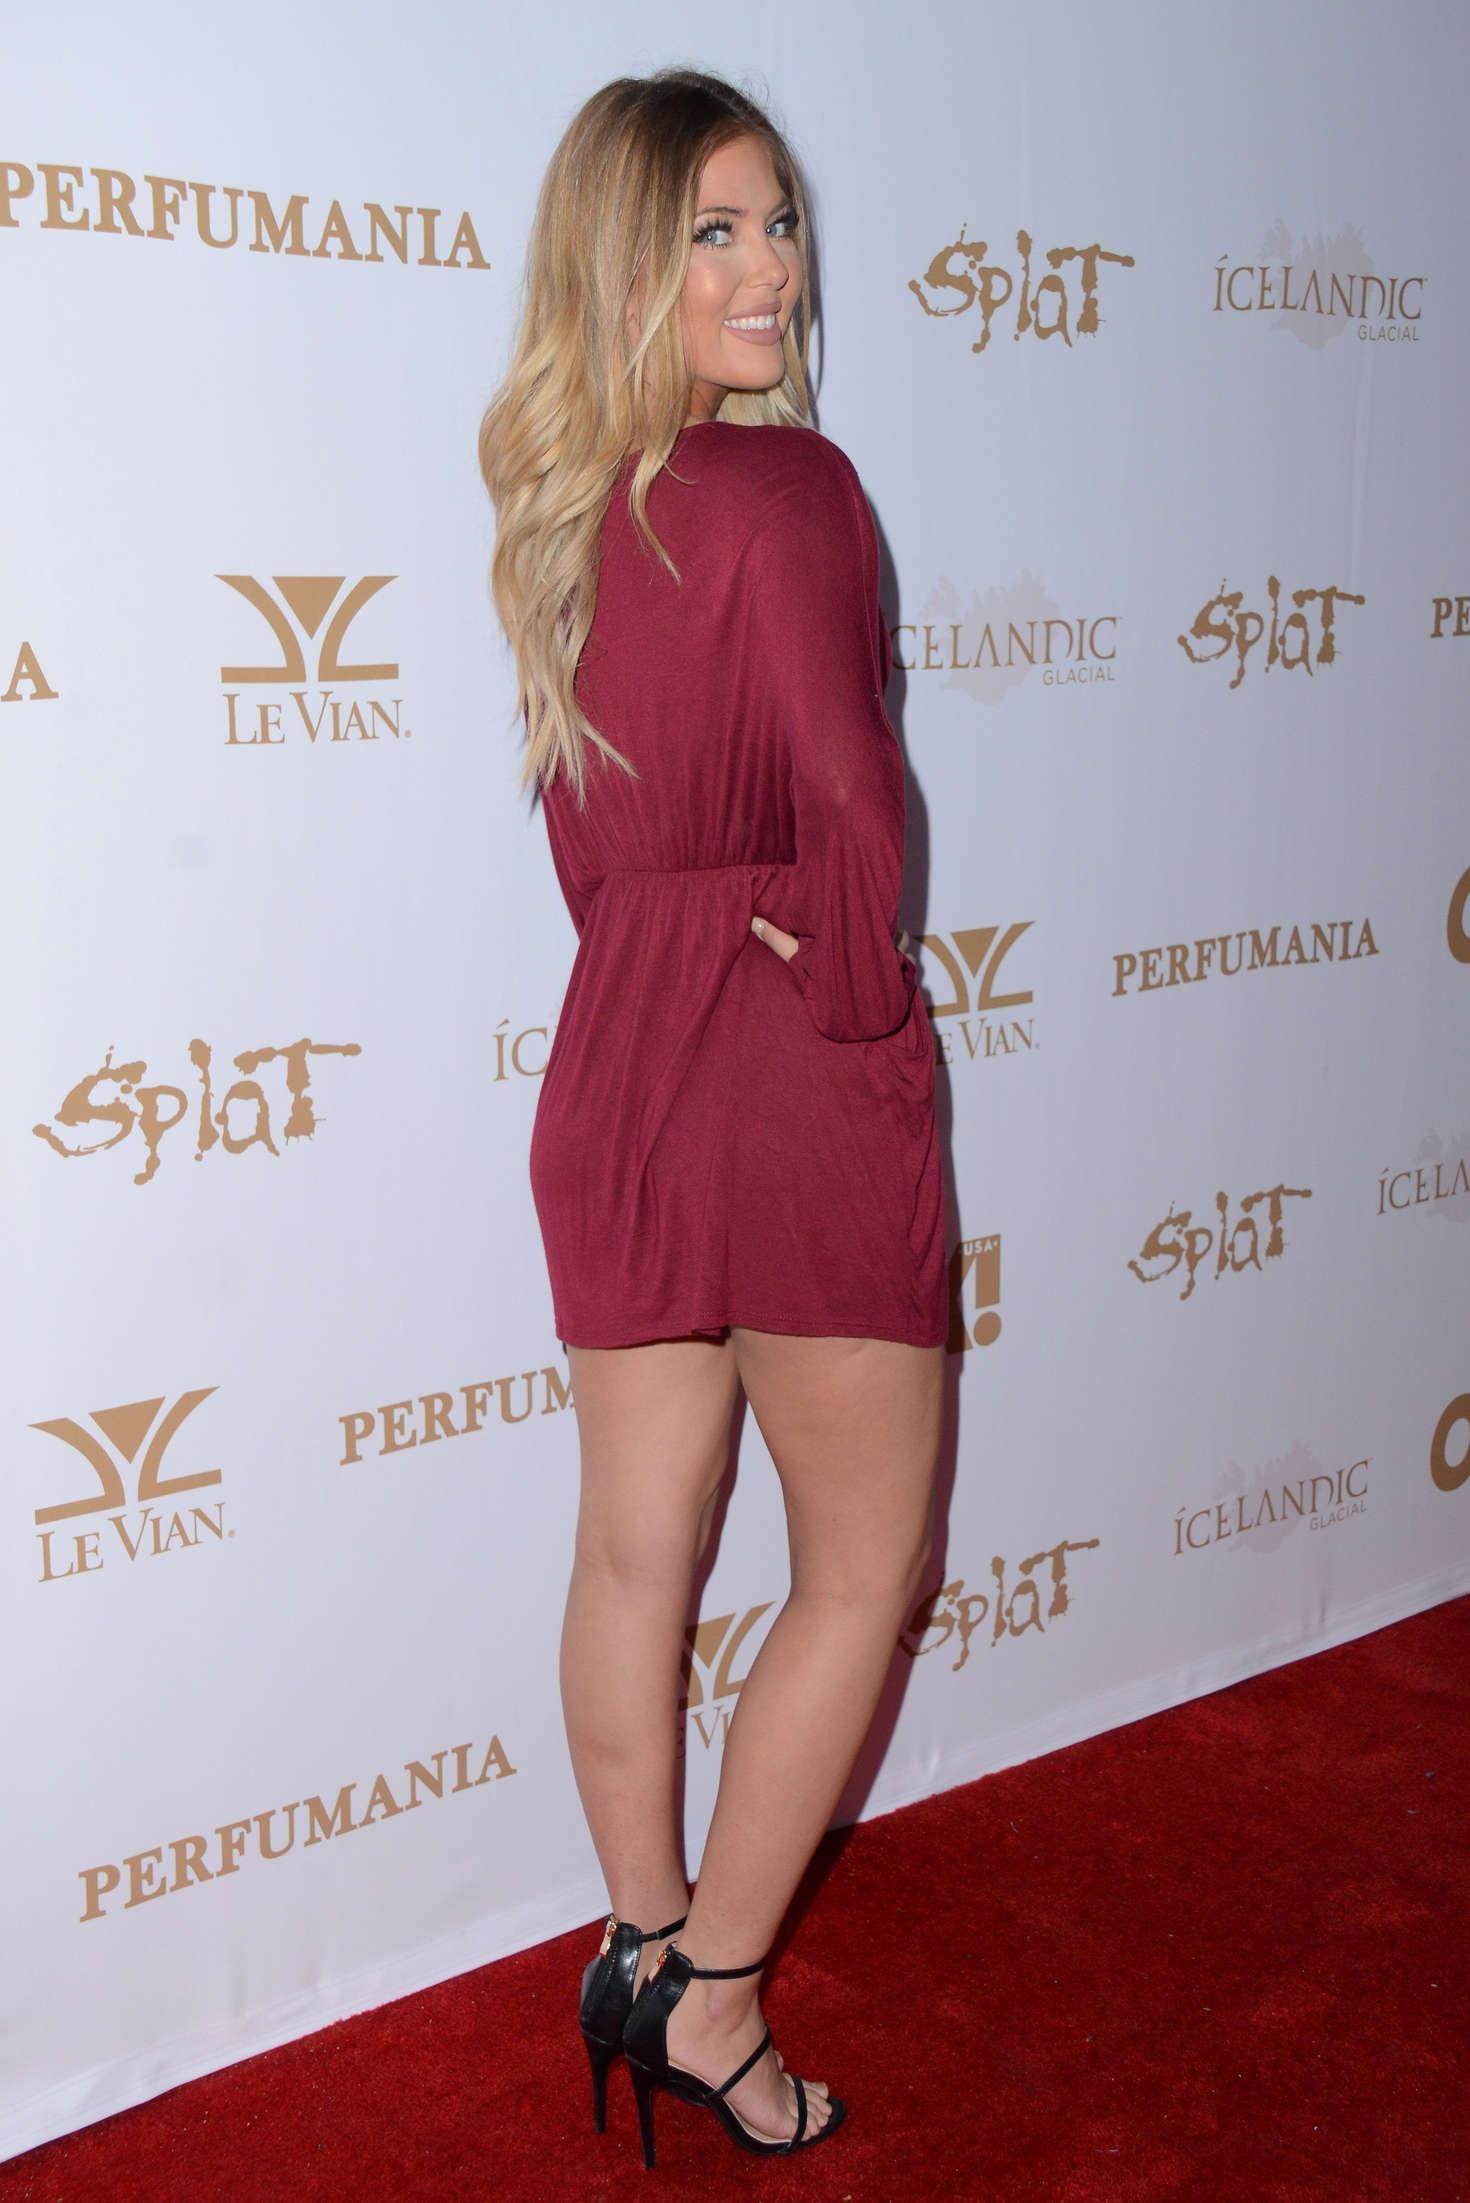 Sophia Pierson OK! Magazines Pre-Grammy Event in Hollywood